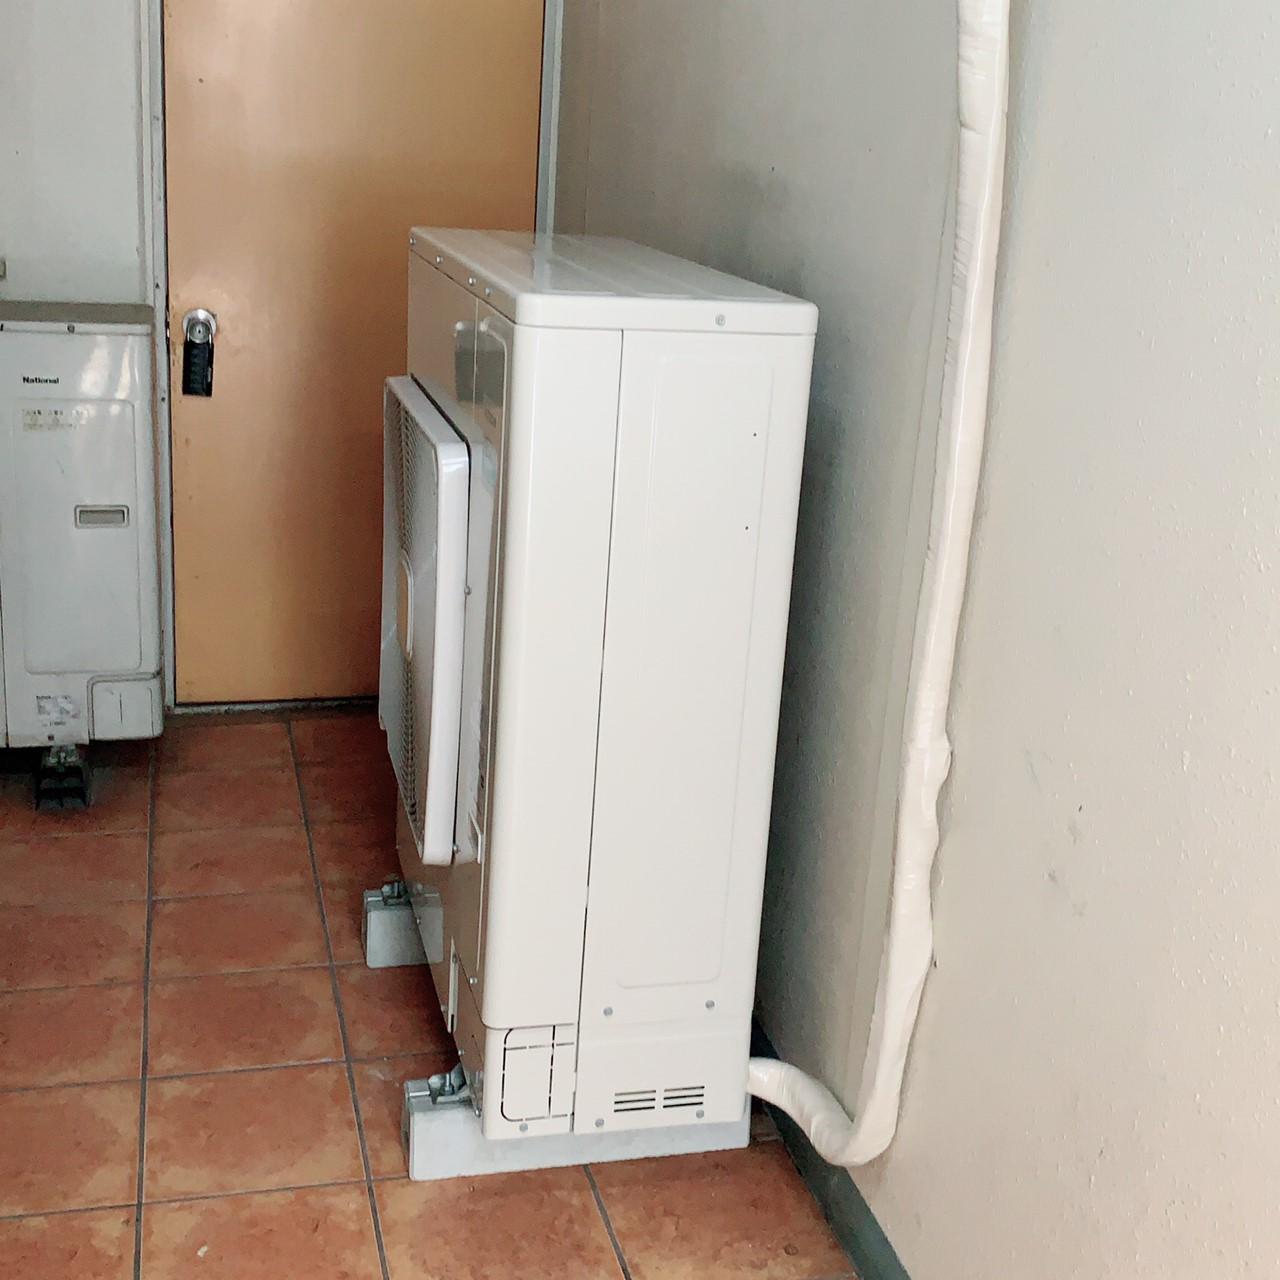 https://eakonya.com/blog/item_images/kobeekimae2.jpg